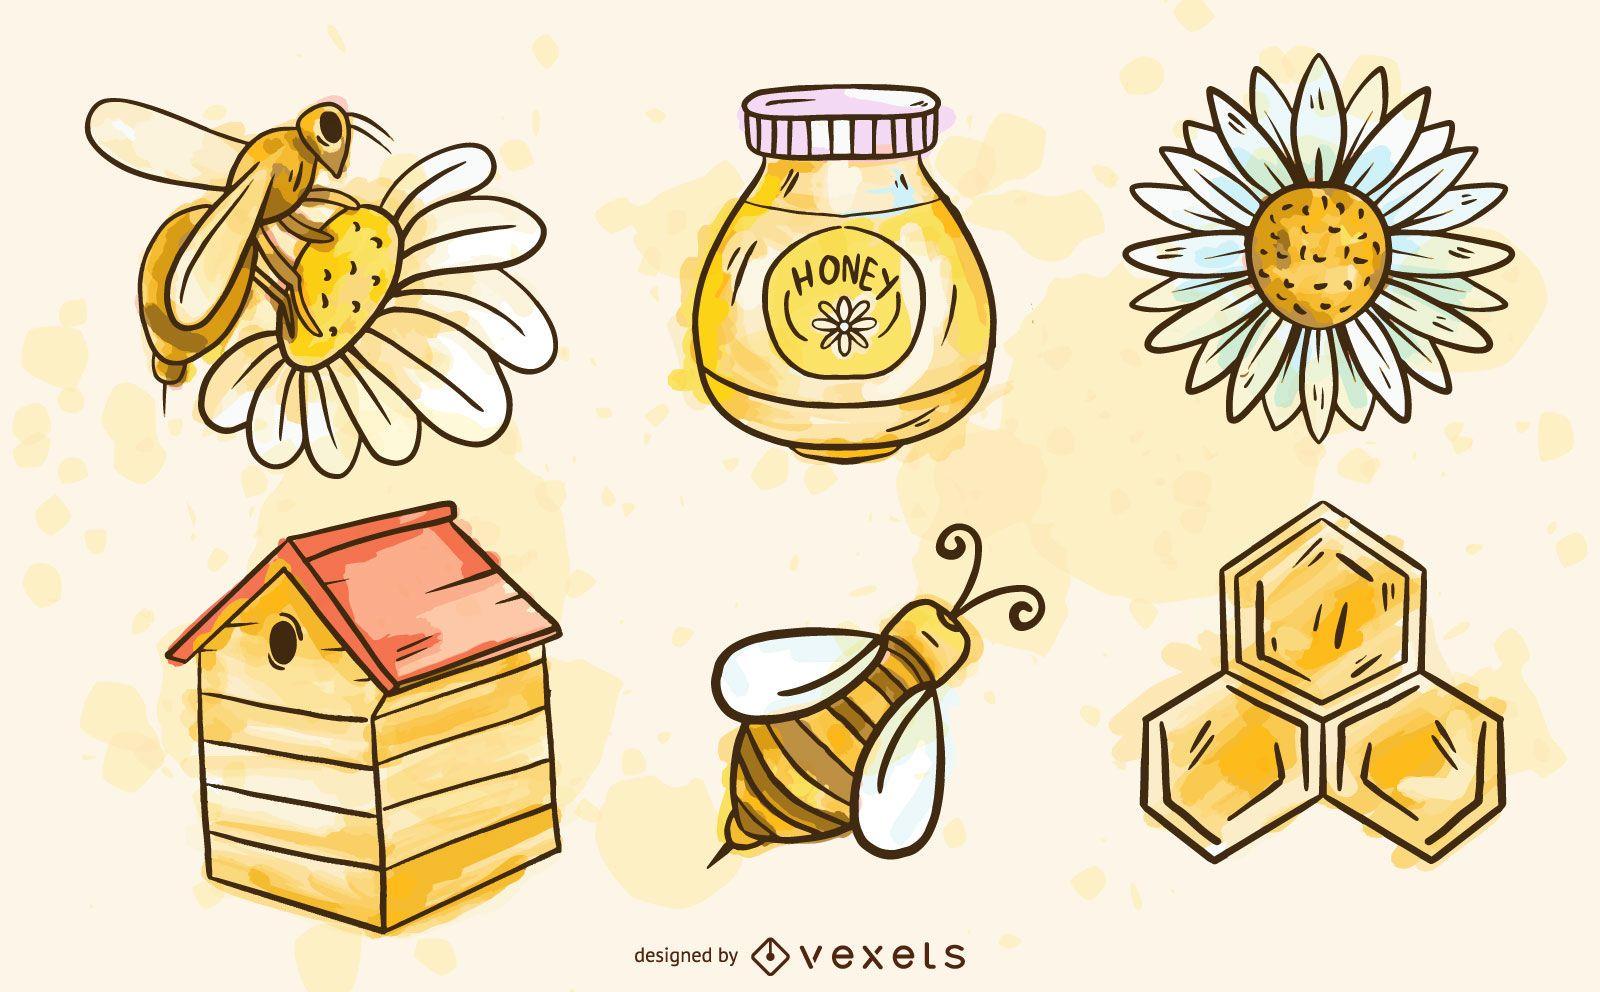 Conjunto de elementos de abeja acuarela